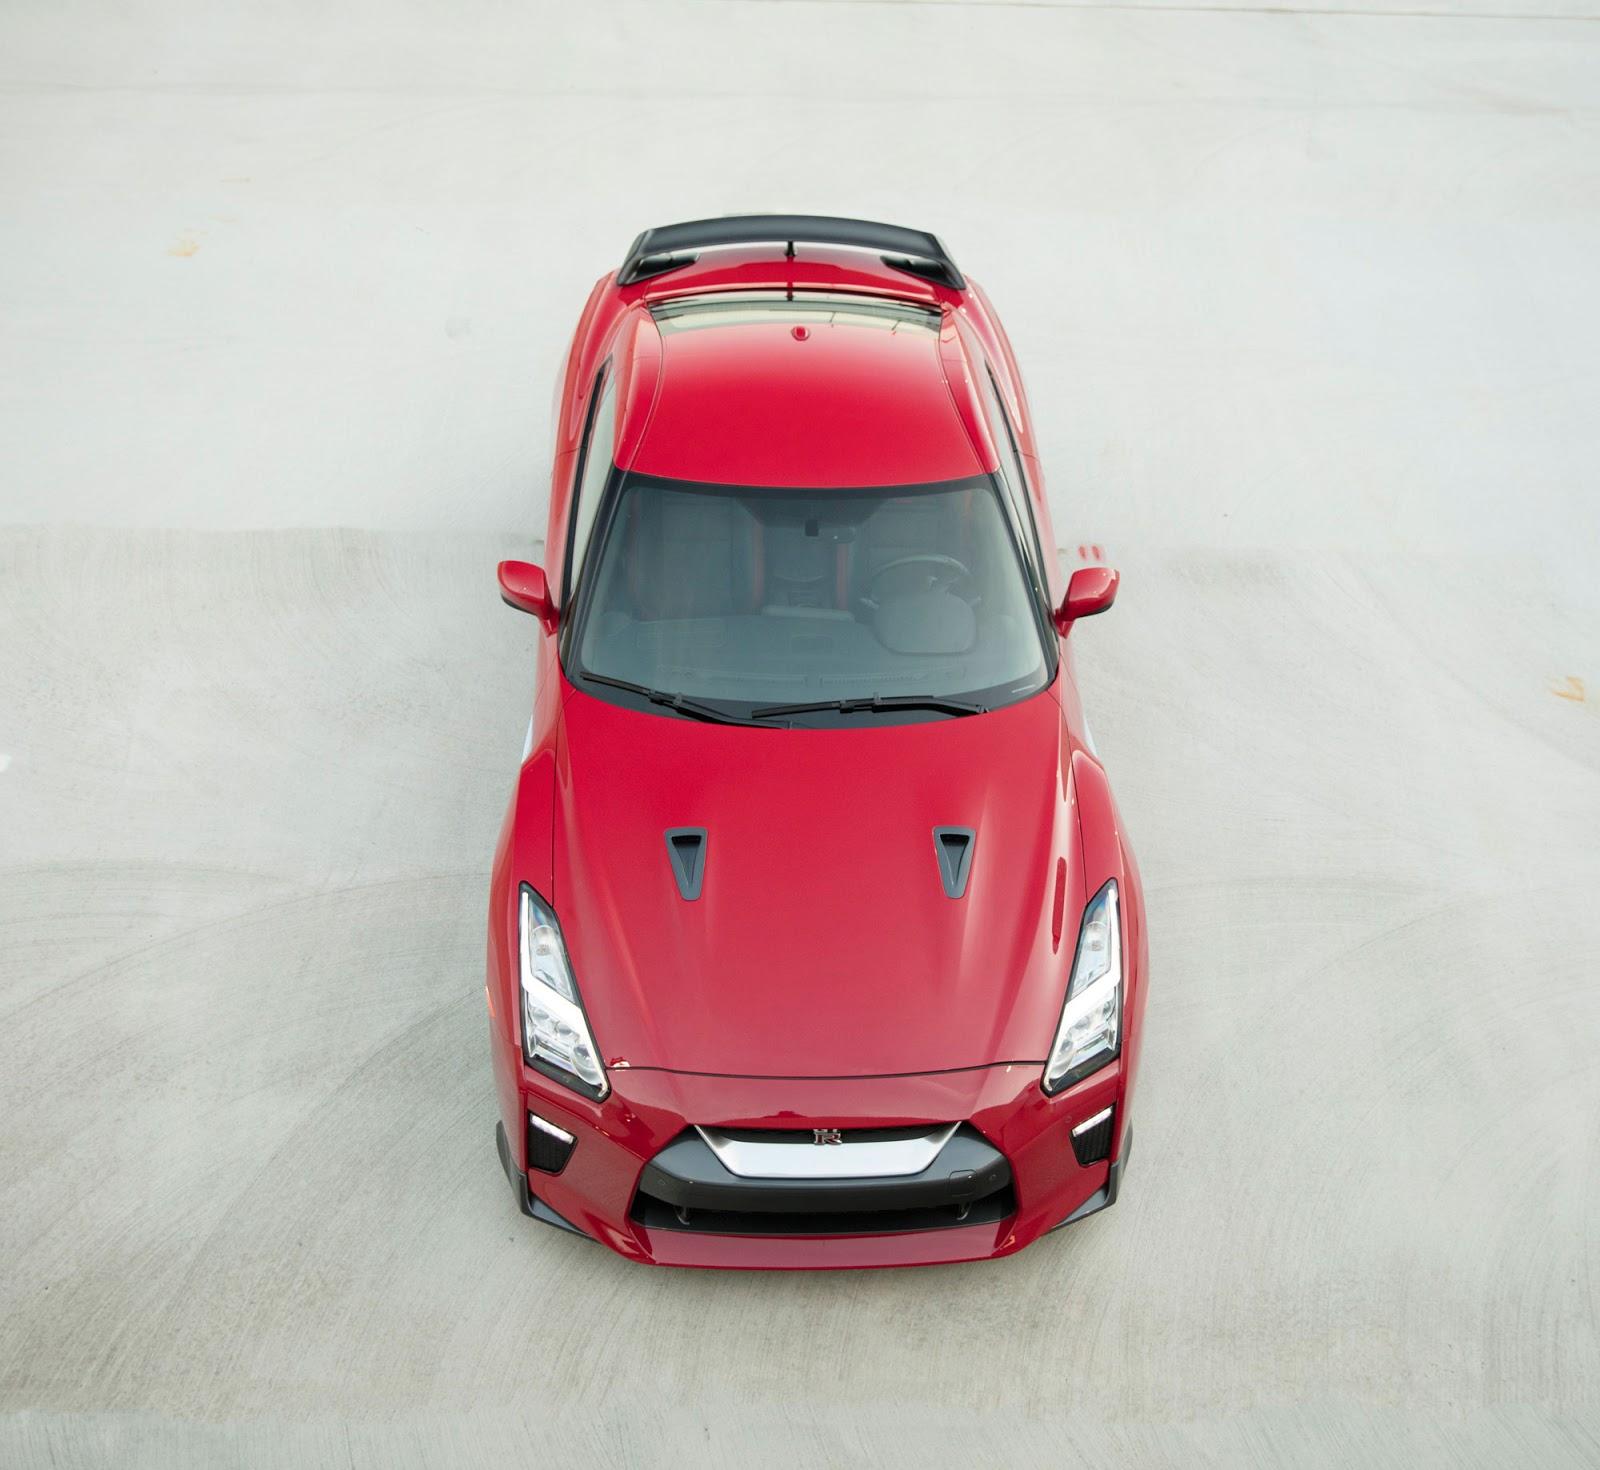 2017 Nissan GT R Track Edition 03 rs252812529 Ένα Nissan GT-R για την πίστα